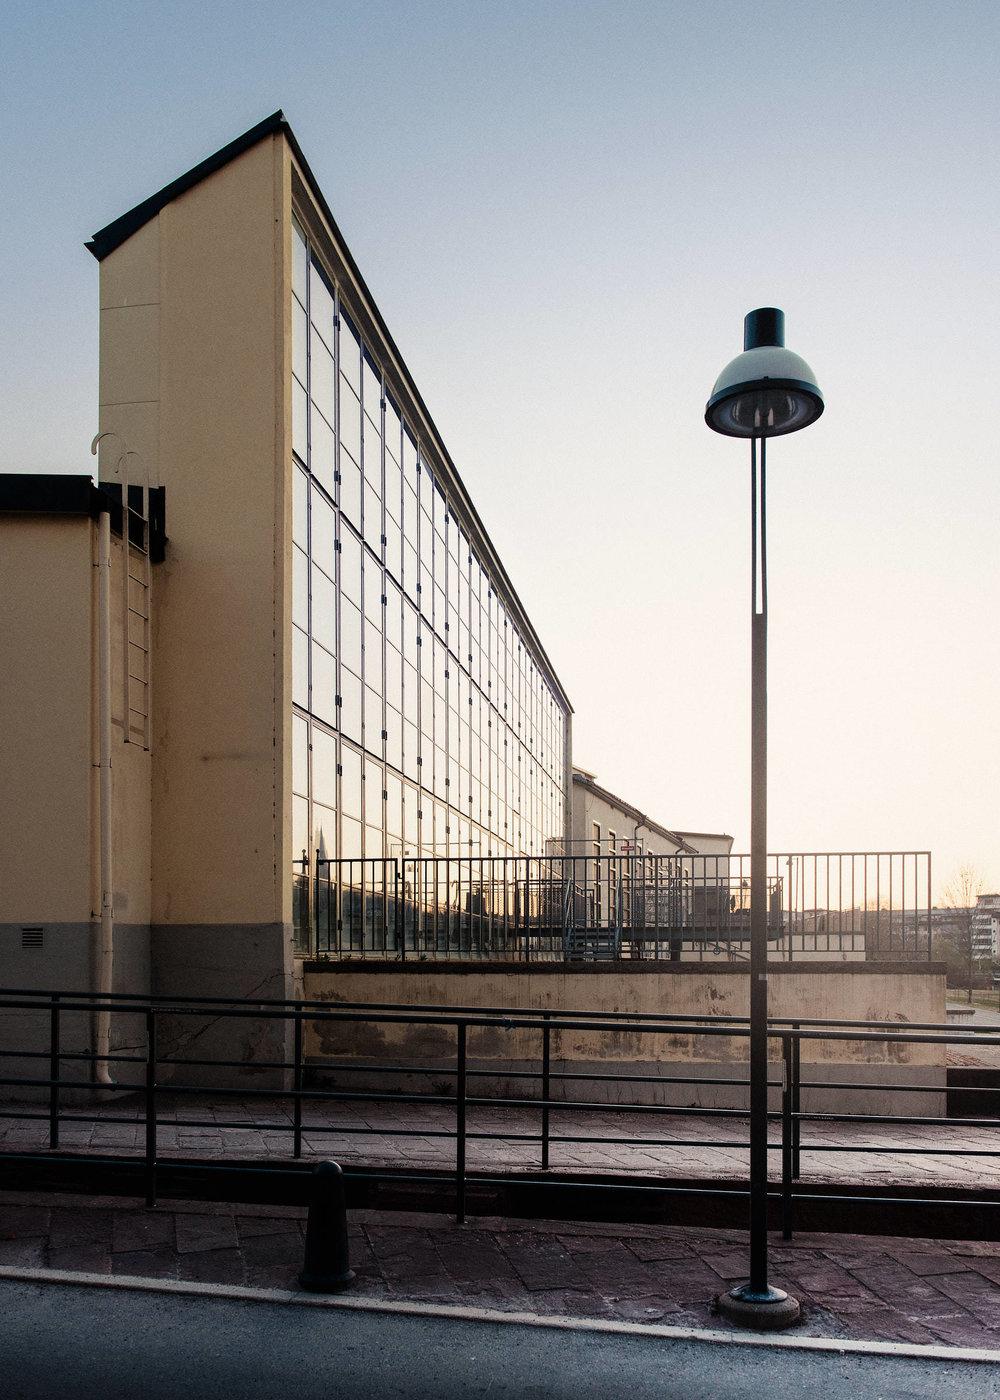 Portfolio_438_Urban Landscape ICA Sverige 2014_2_KRISTOFER SAMUELSSON PHOTOGRAPHY.jpg